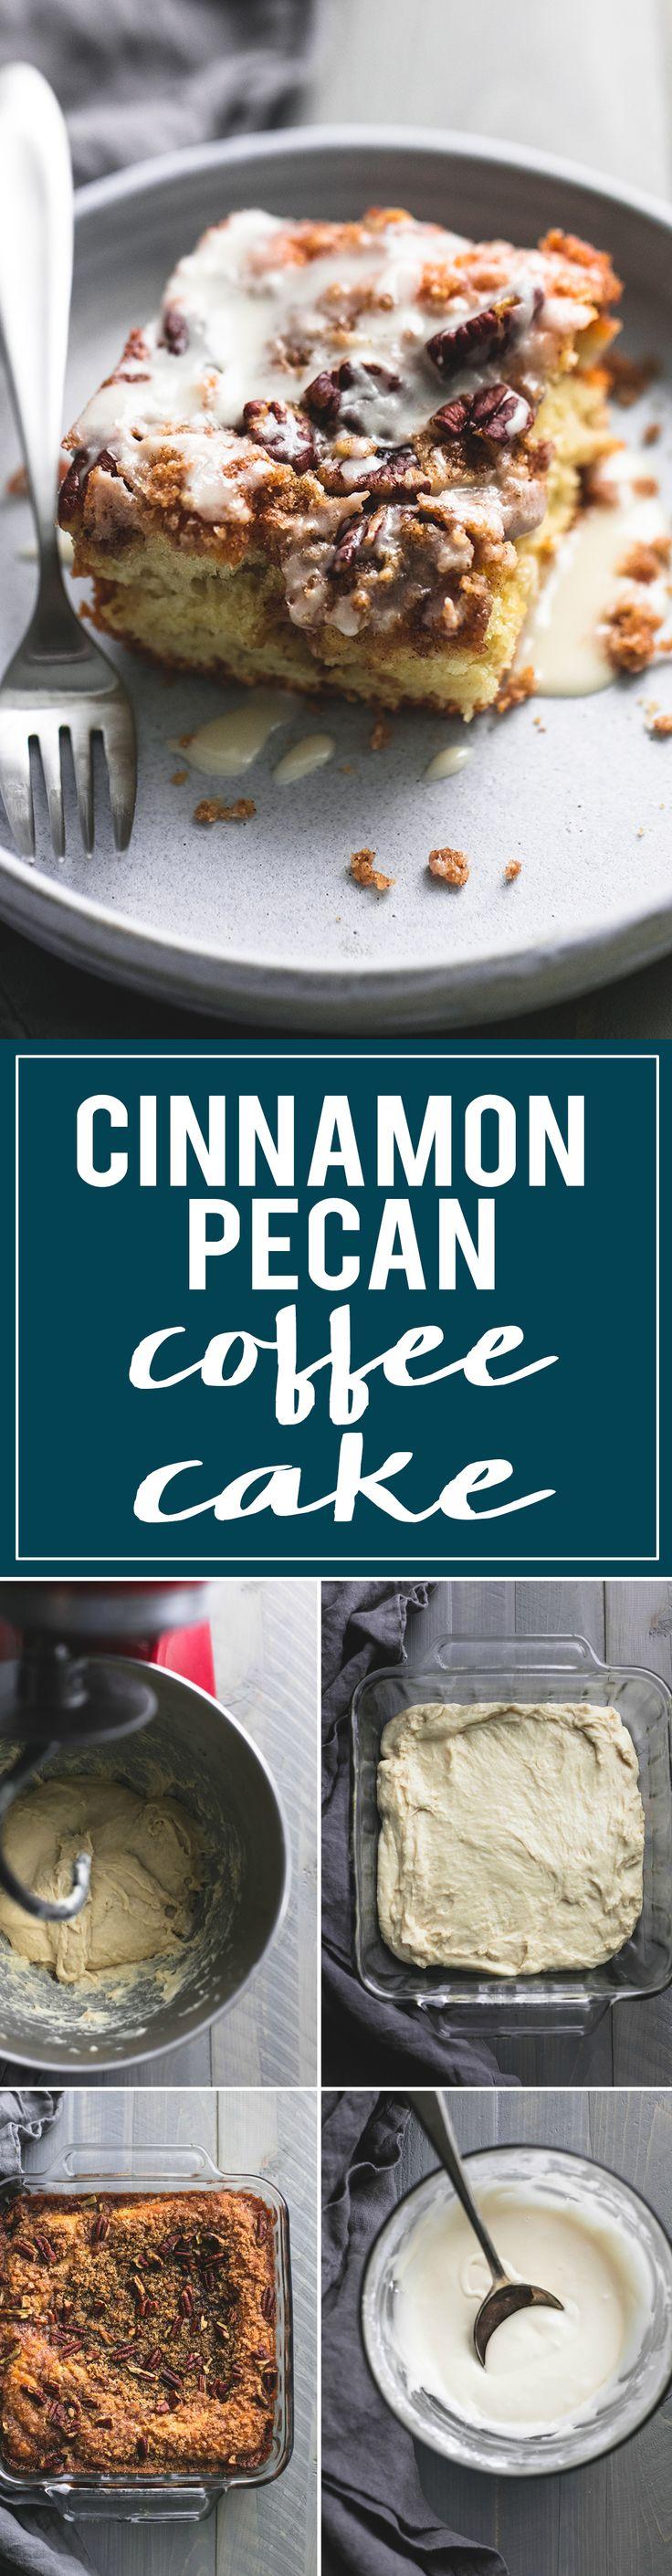 Easy Cinnamon Pecan Coffee Cake | lecremedelacrumb.com